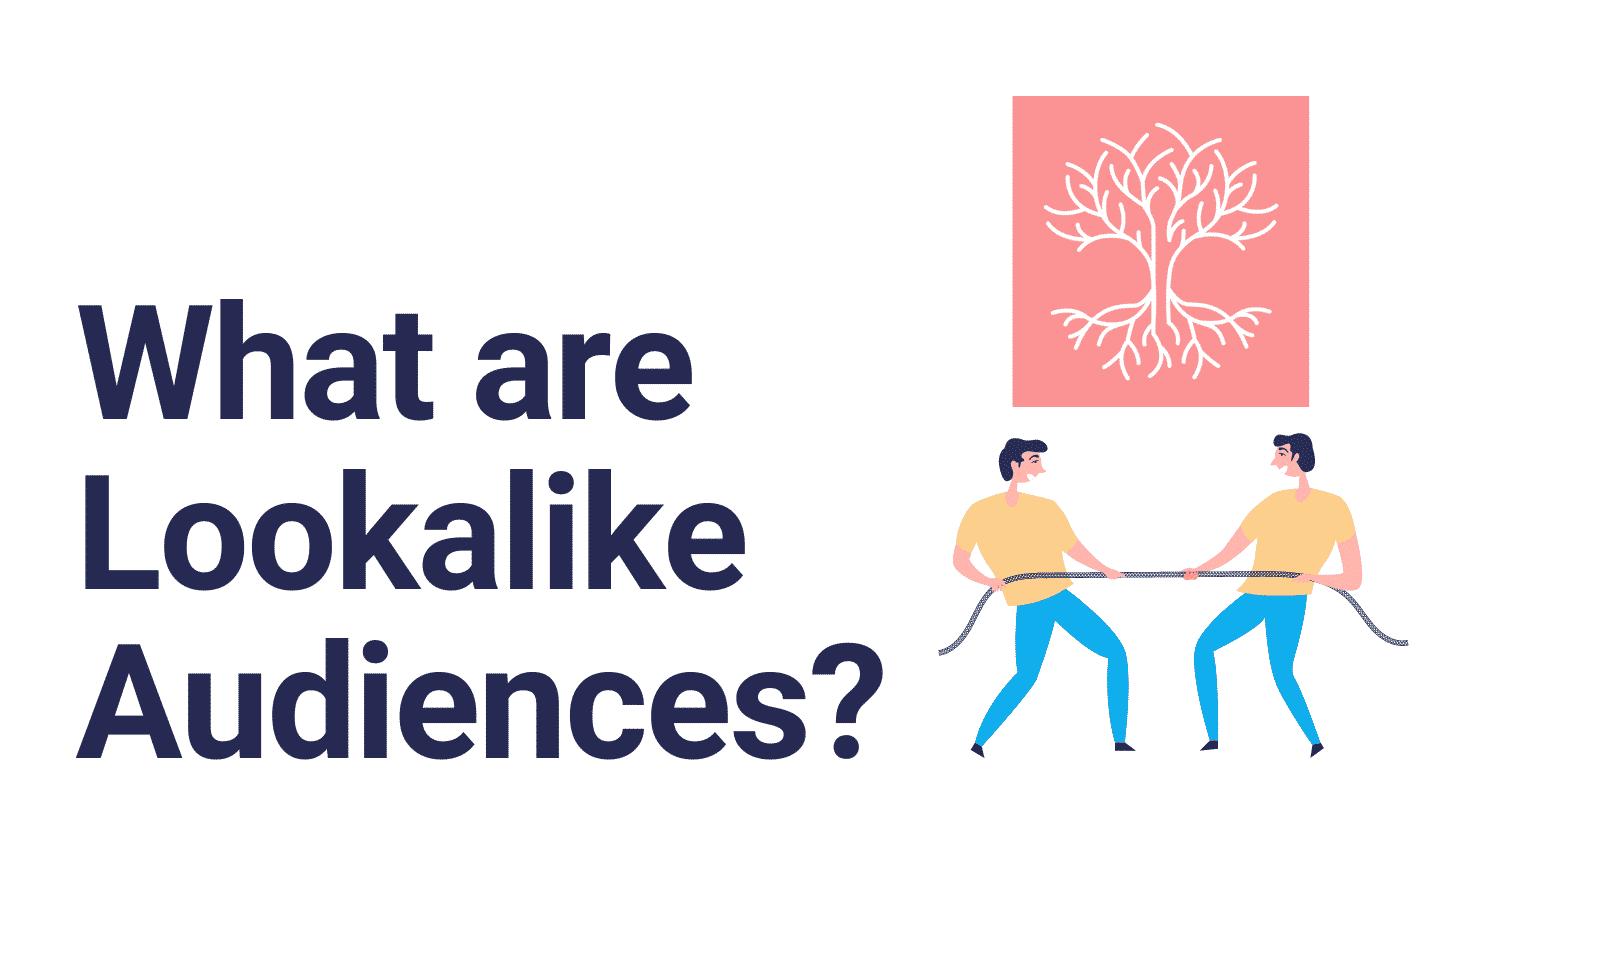 lookalike audiences cannabis cbd advertising